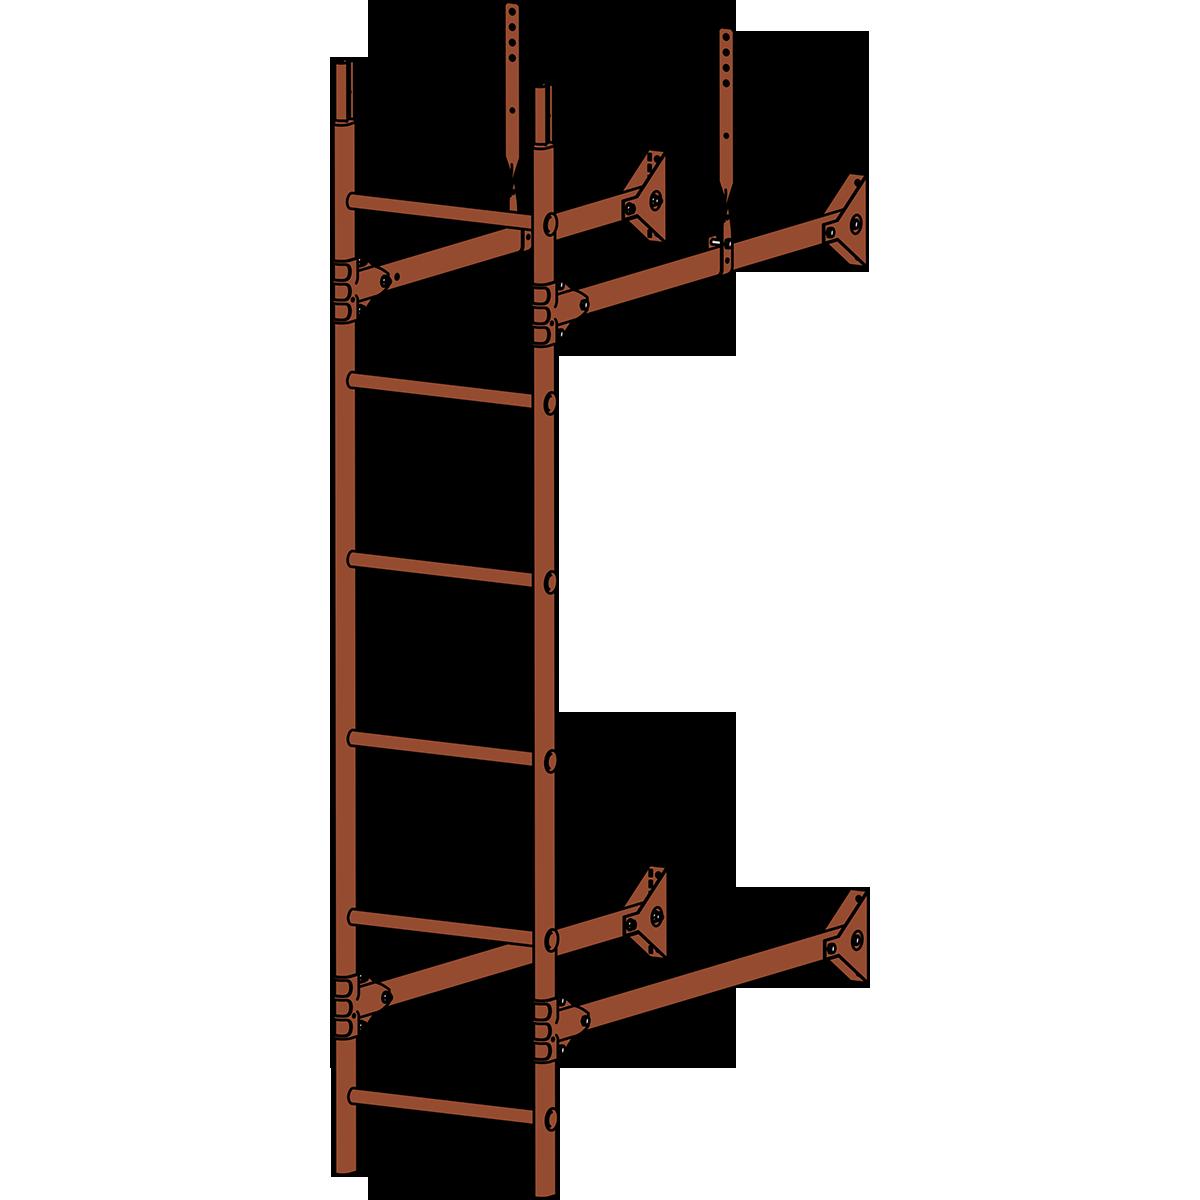 Лестница стеновая ROOFSYSTEMS PRESTIGE ZN 1,2 м RAL 8004 Коричневая медь